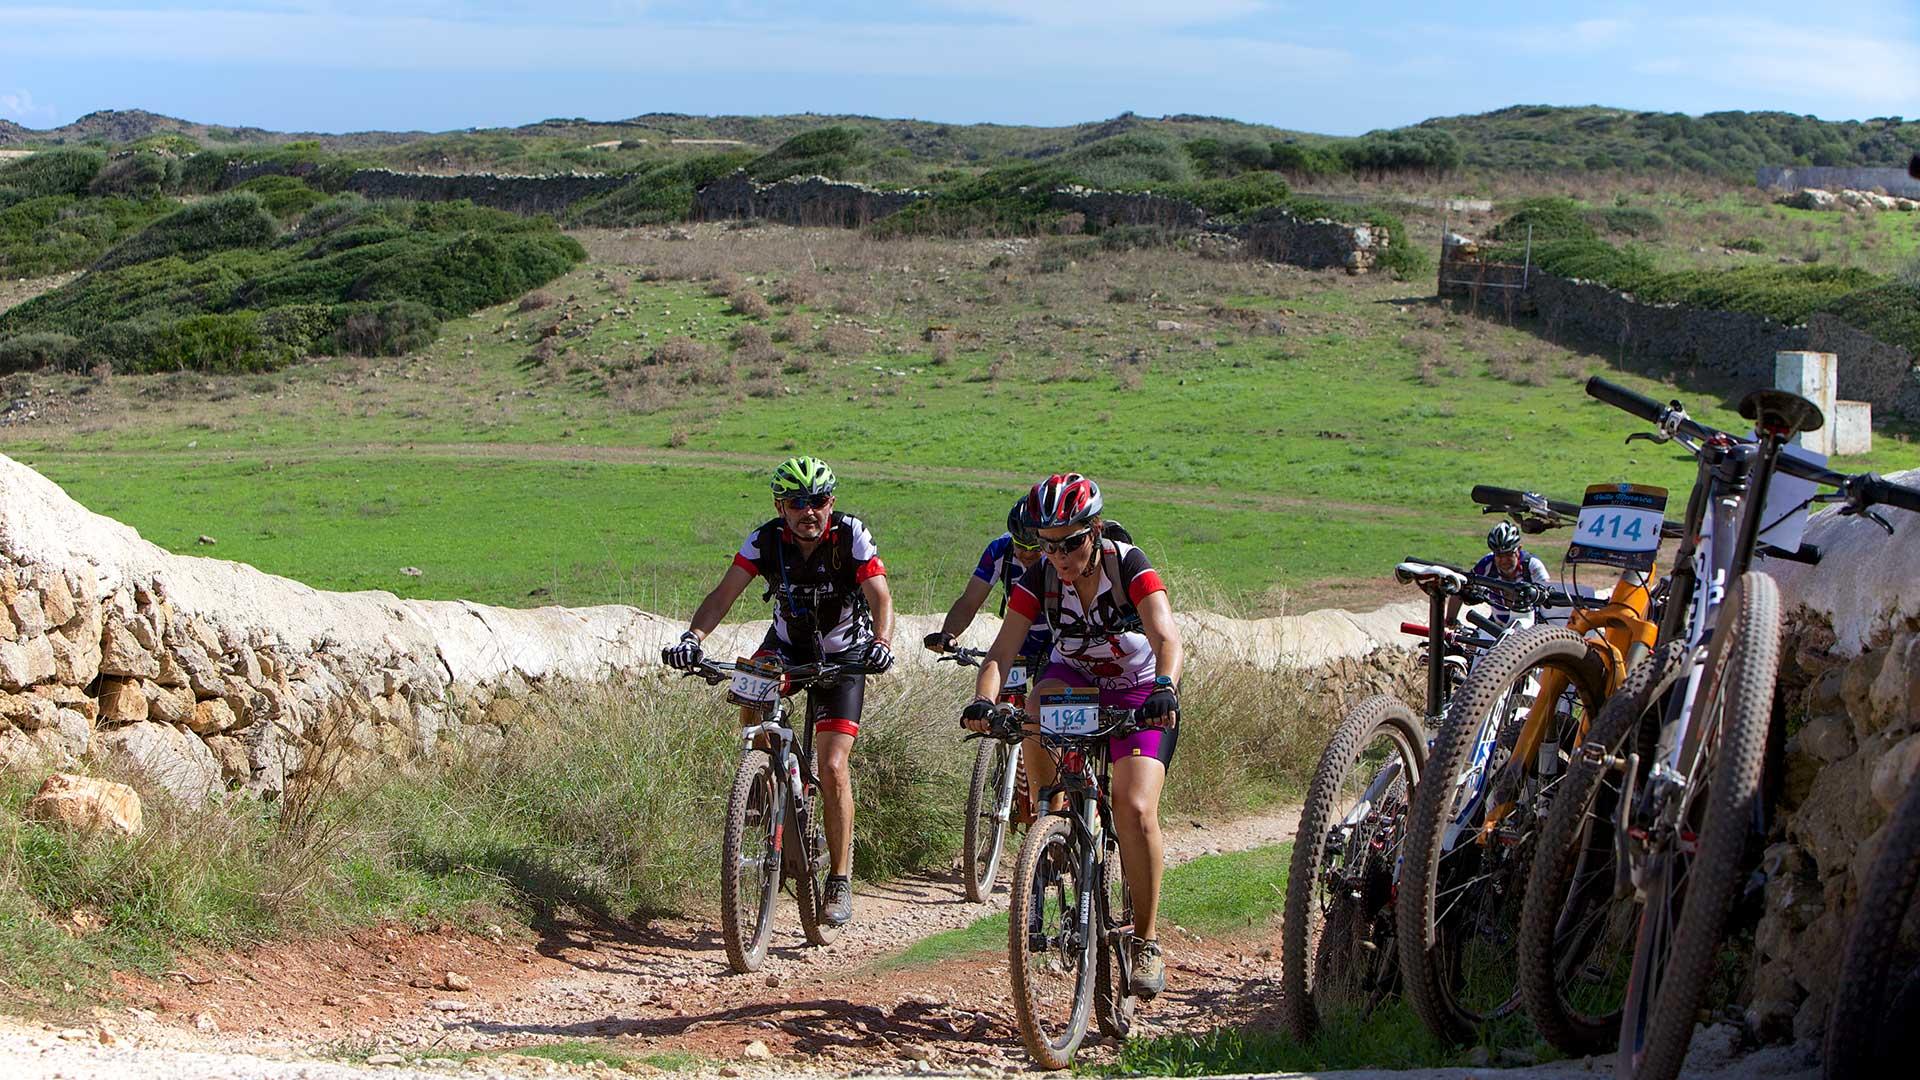 Imagen  Enamórate del paisaje rural de Menorca, en bici